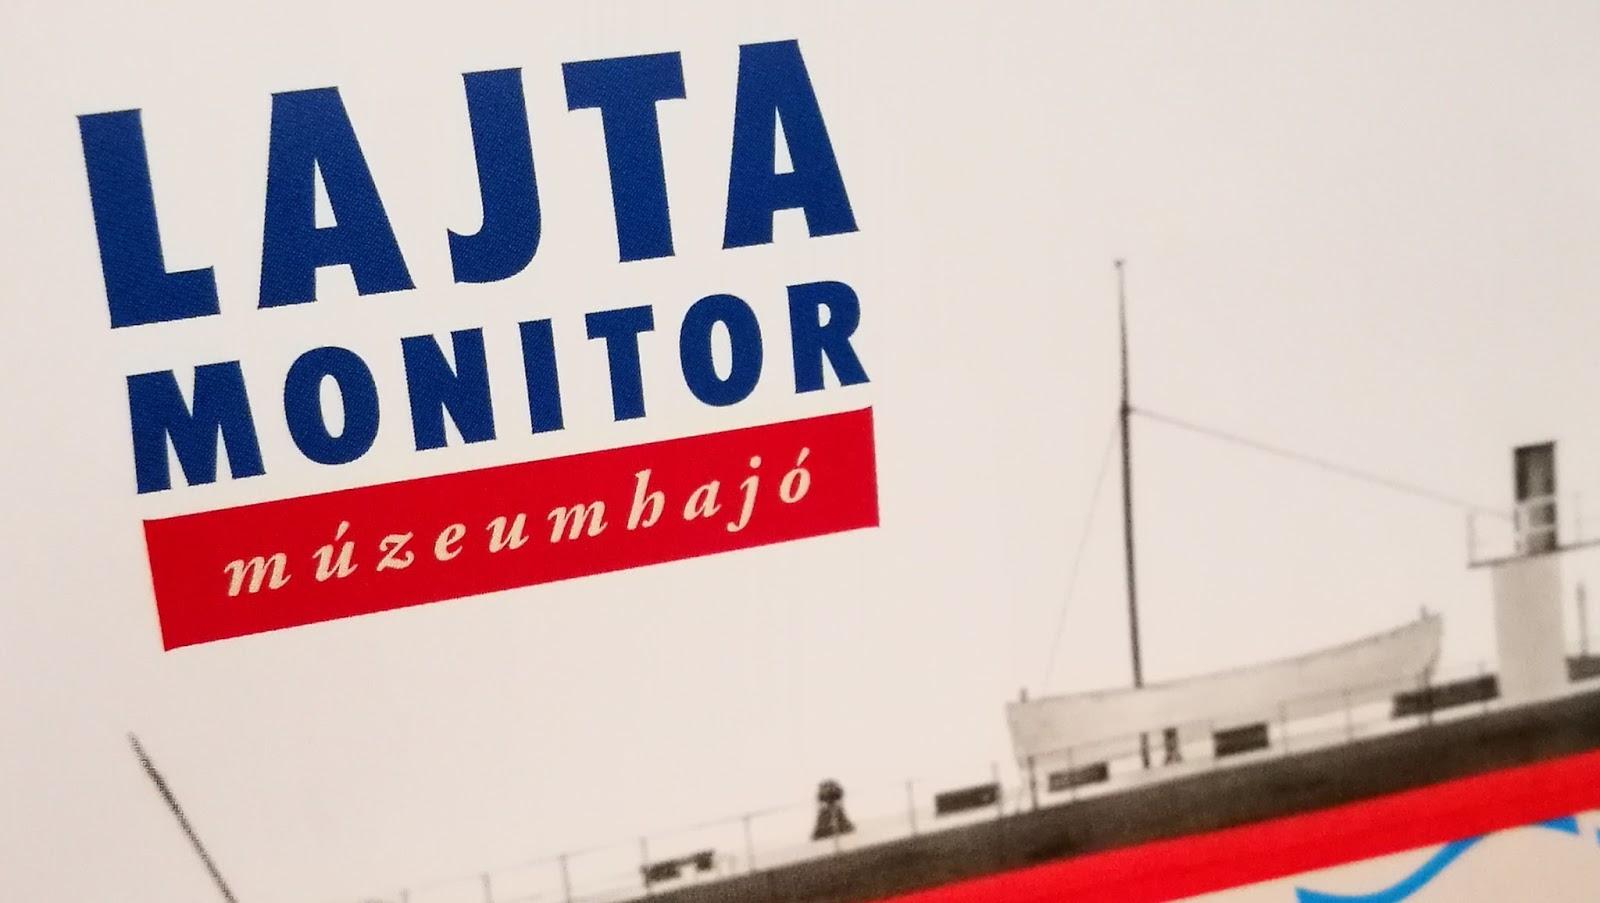 Lajta monitor múzeumhajó Dunaújvárosban